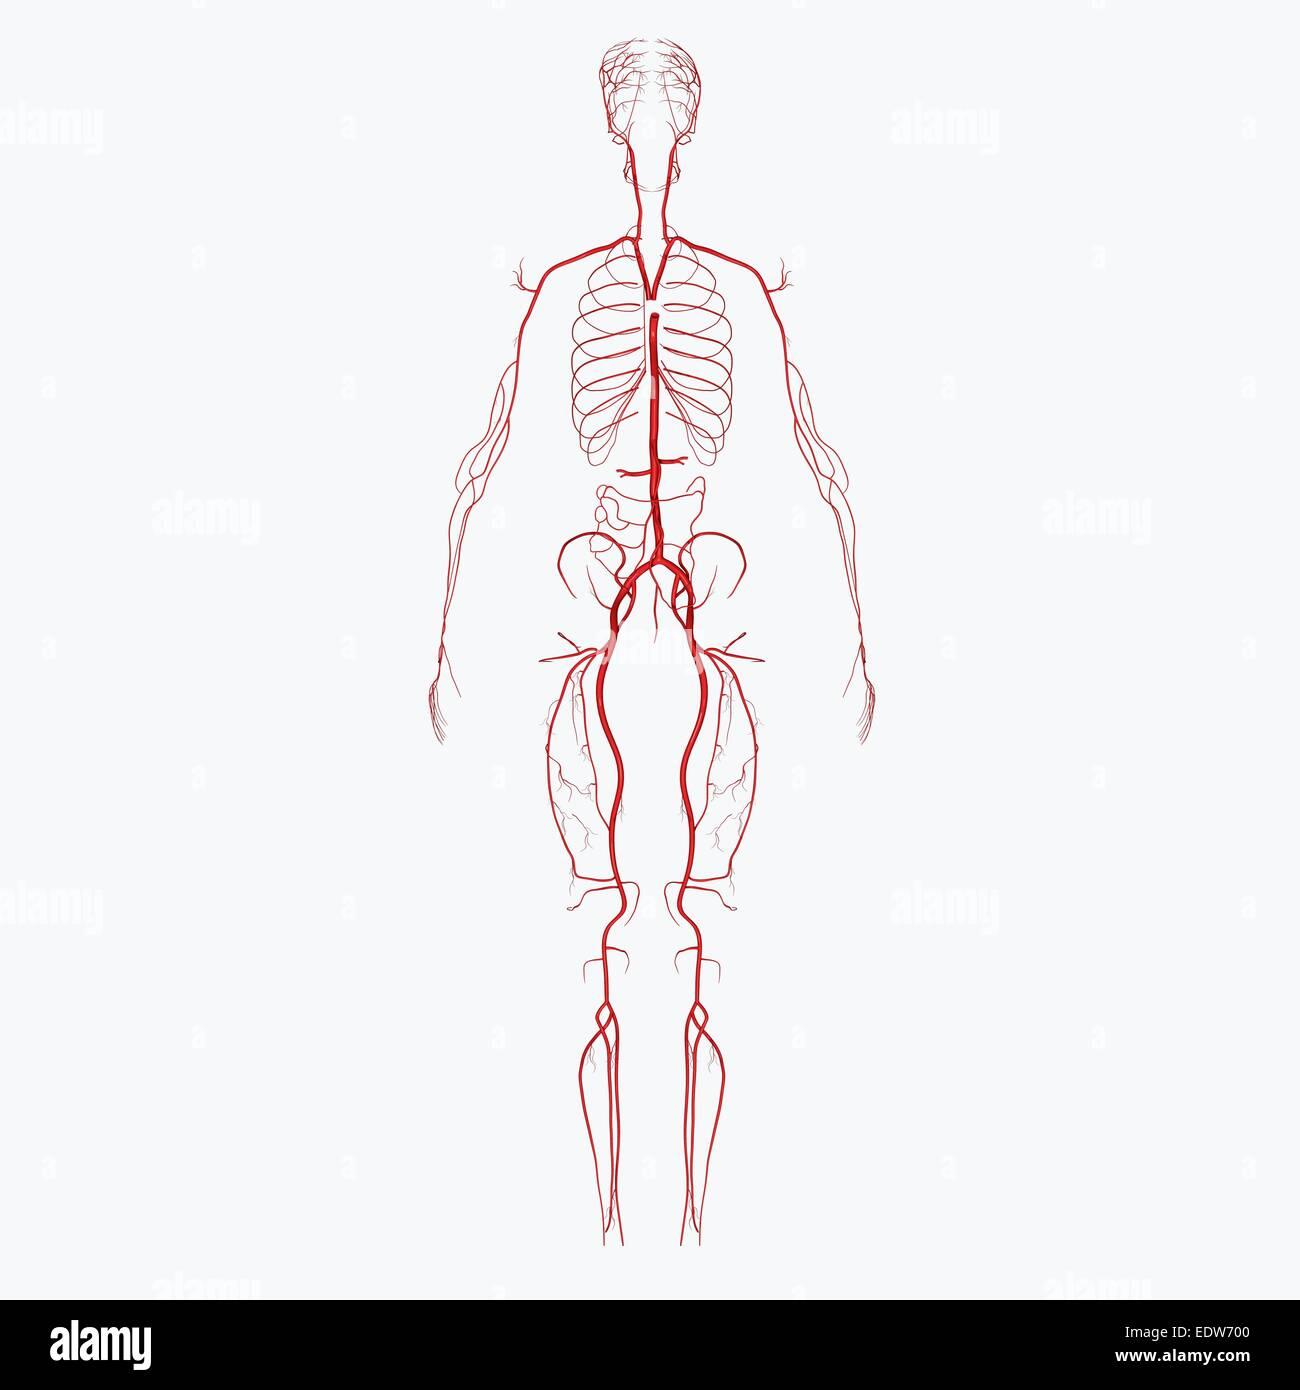 Human Arteries Stock Photo 77386288 Alamy